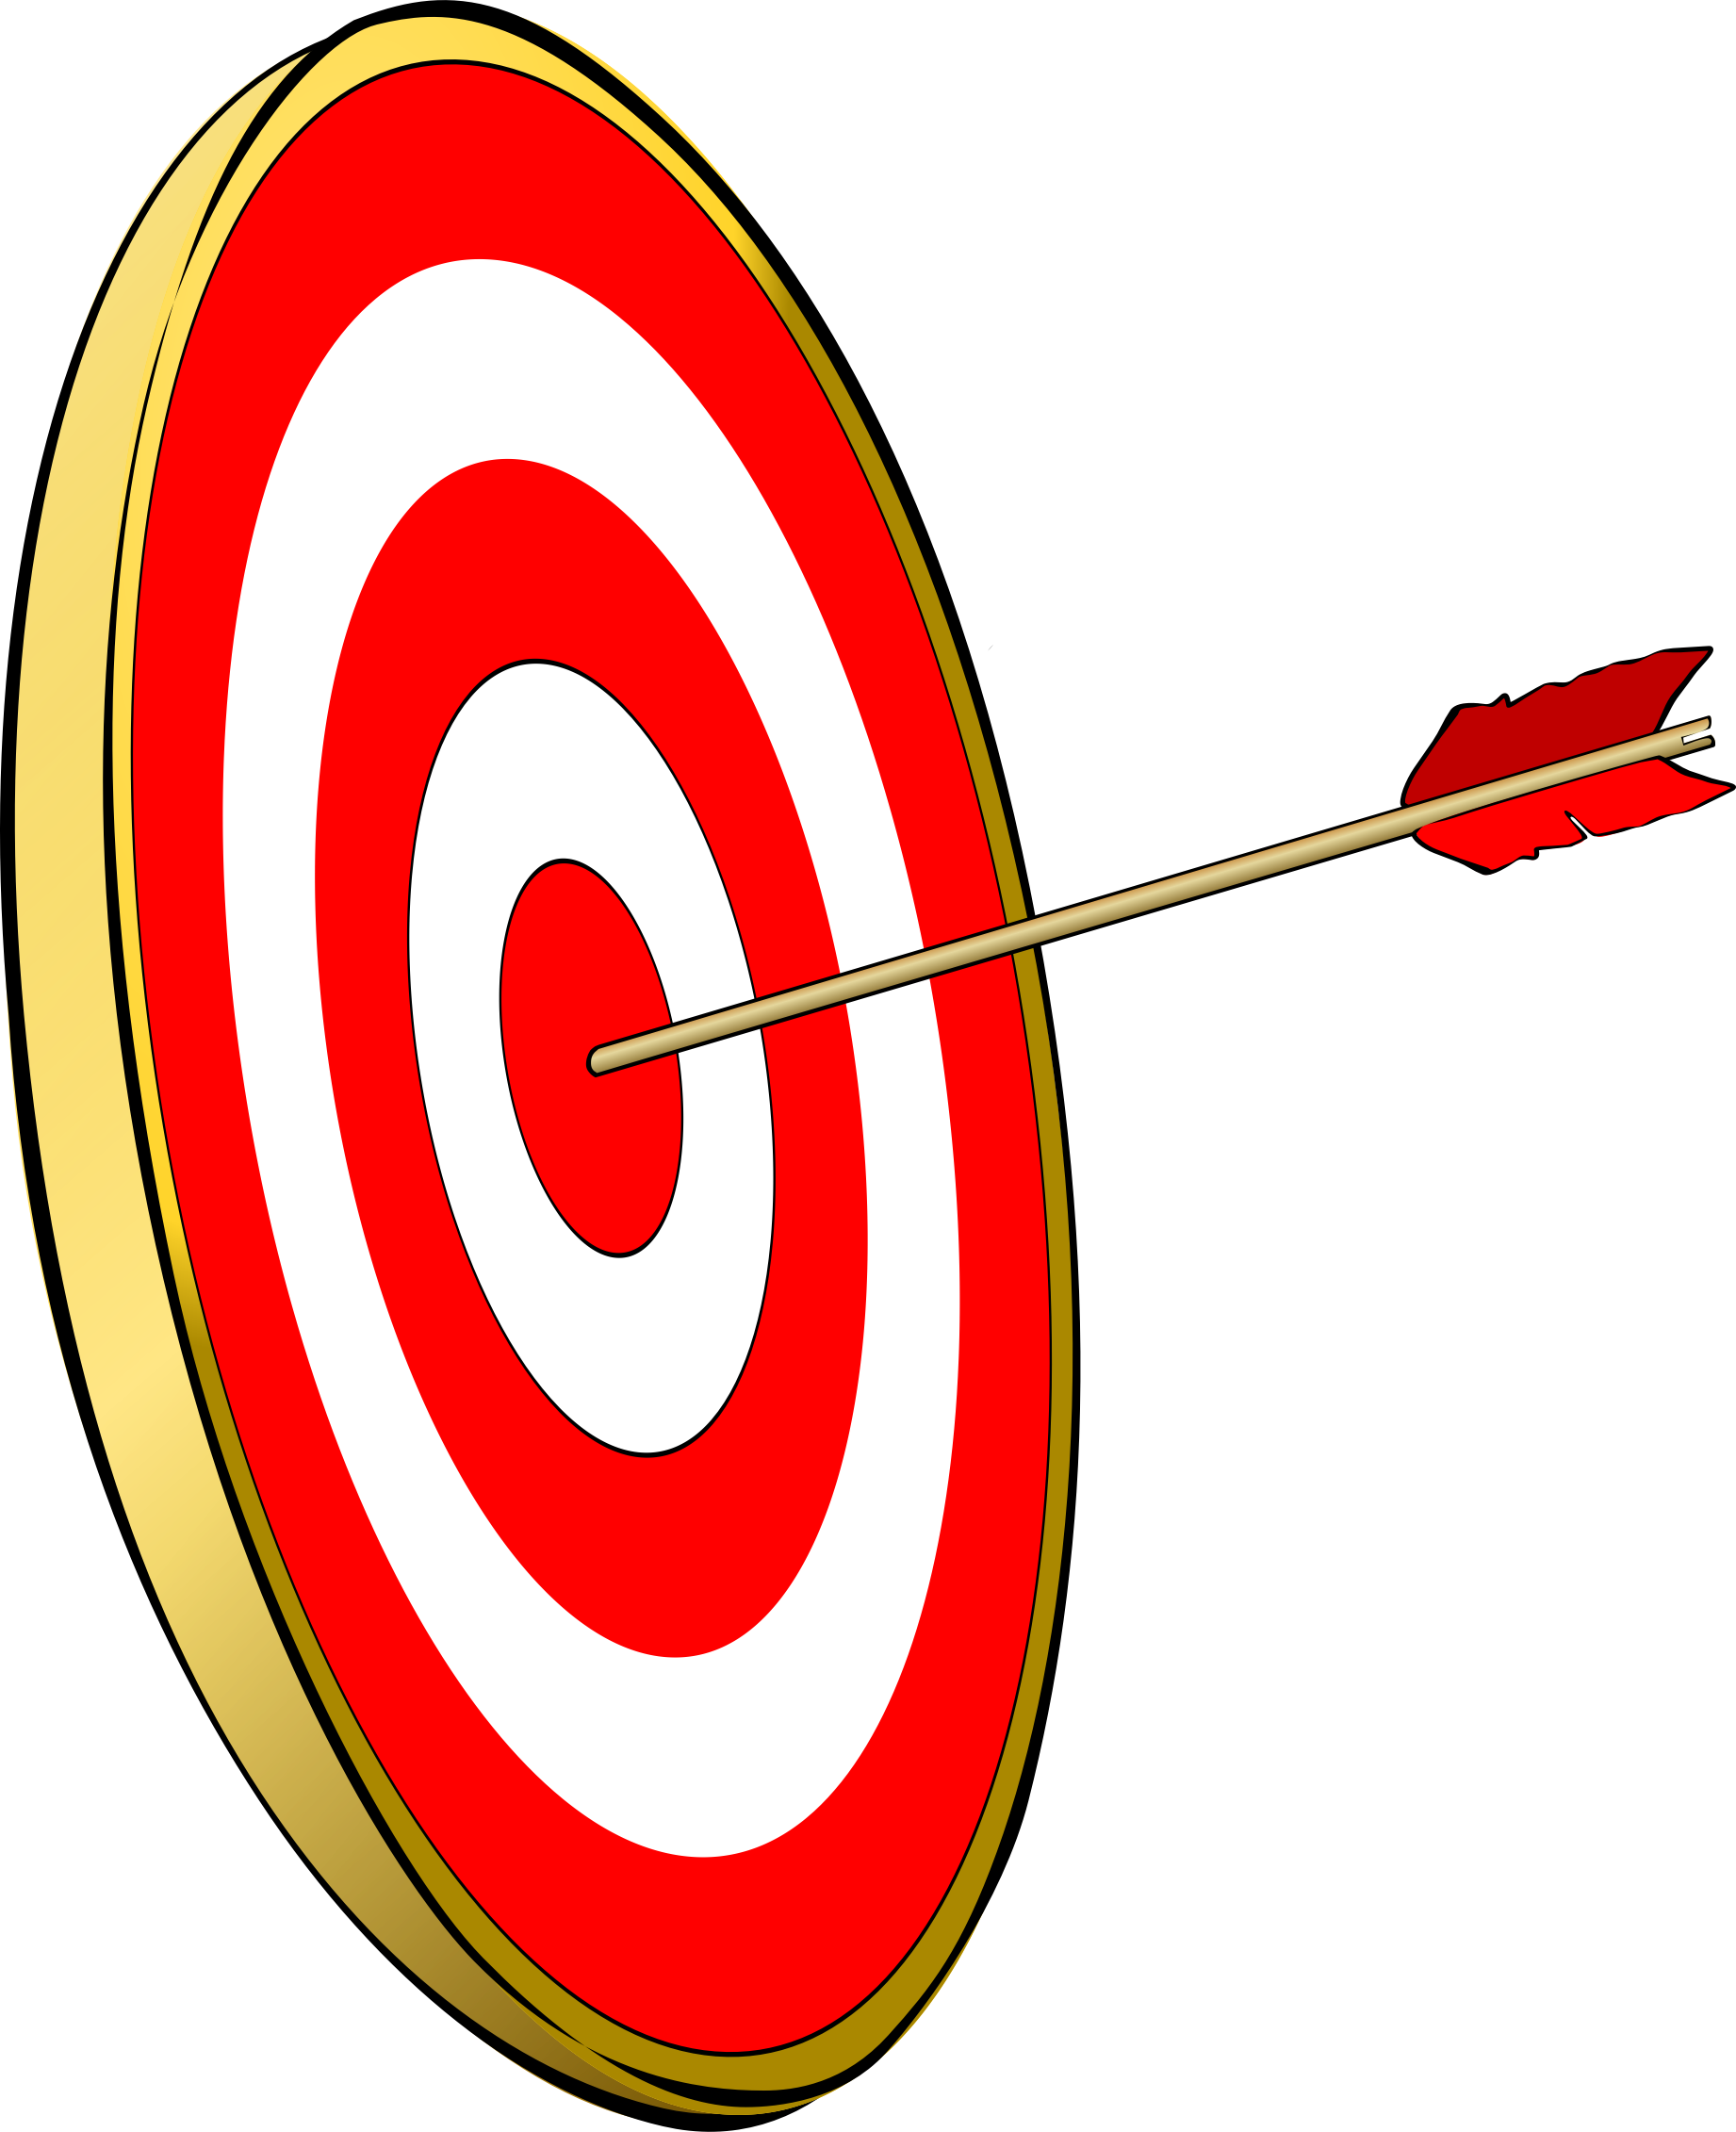 Clipart bullseye